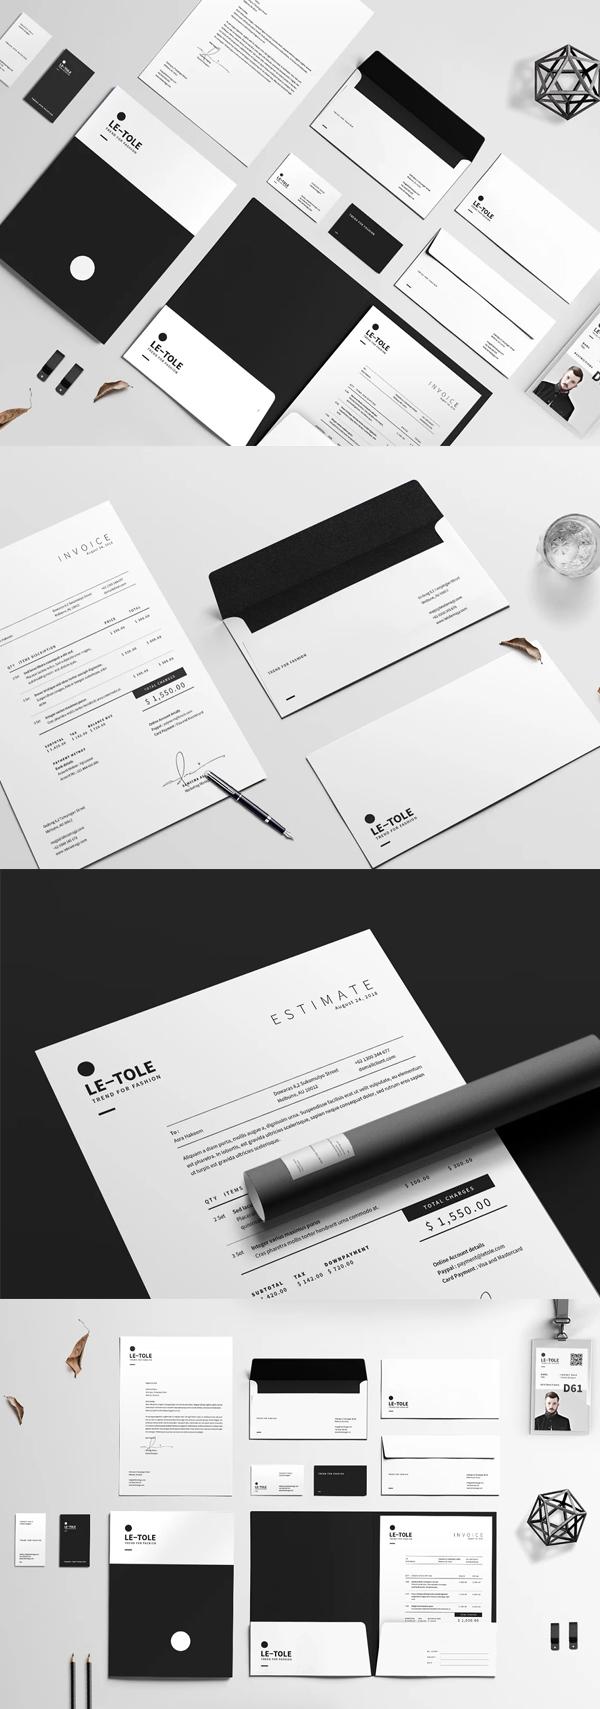 Corporate Identity Stationery Items